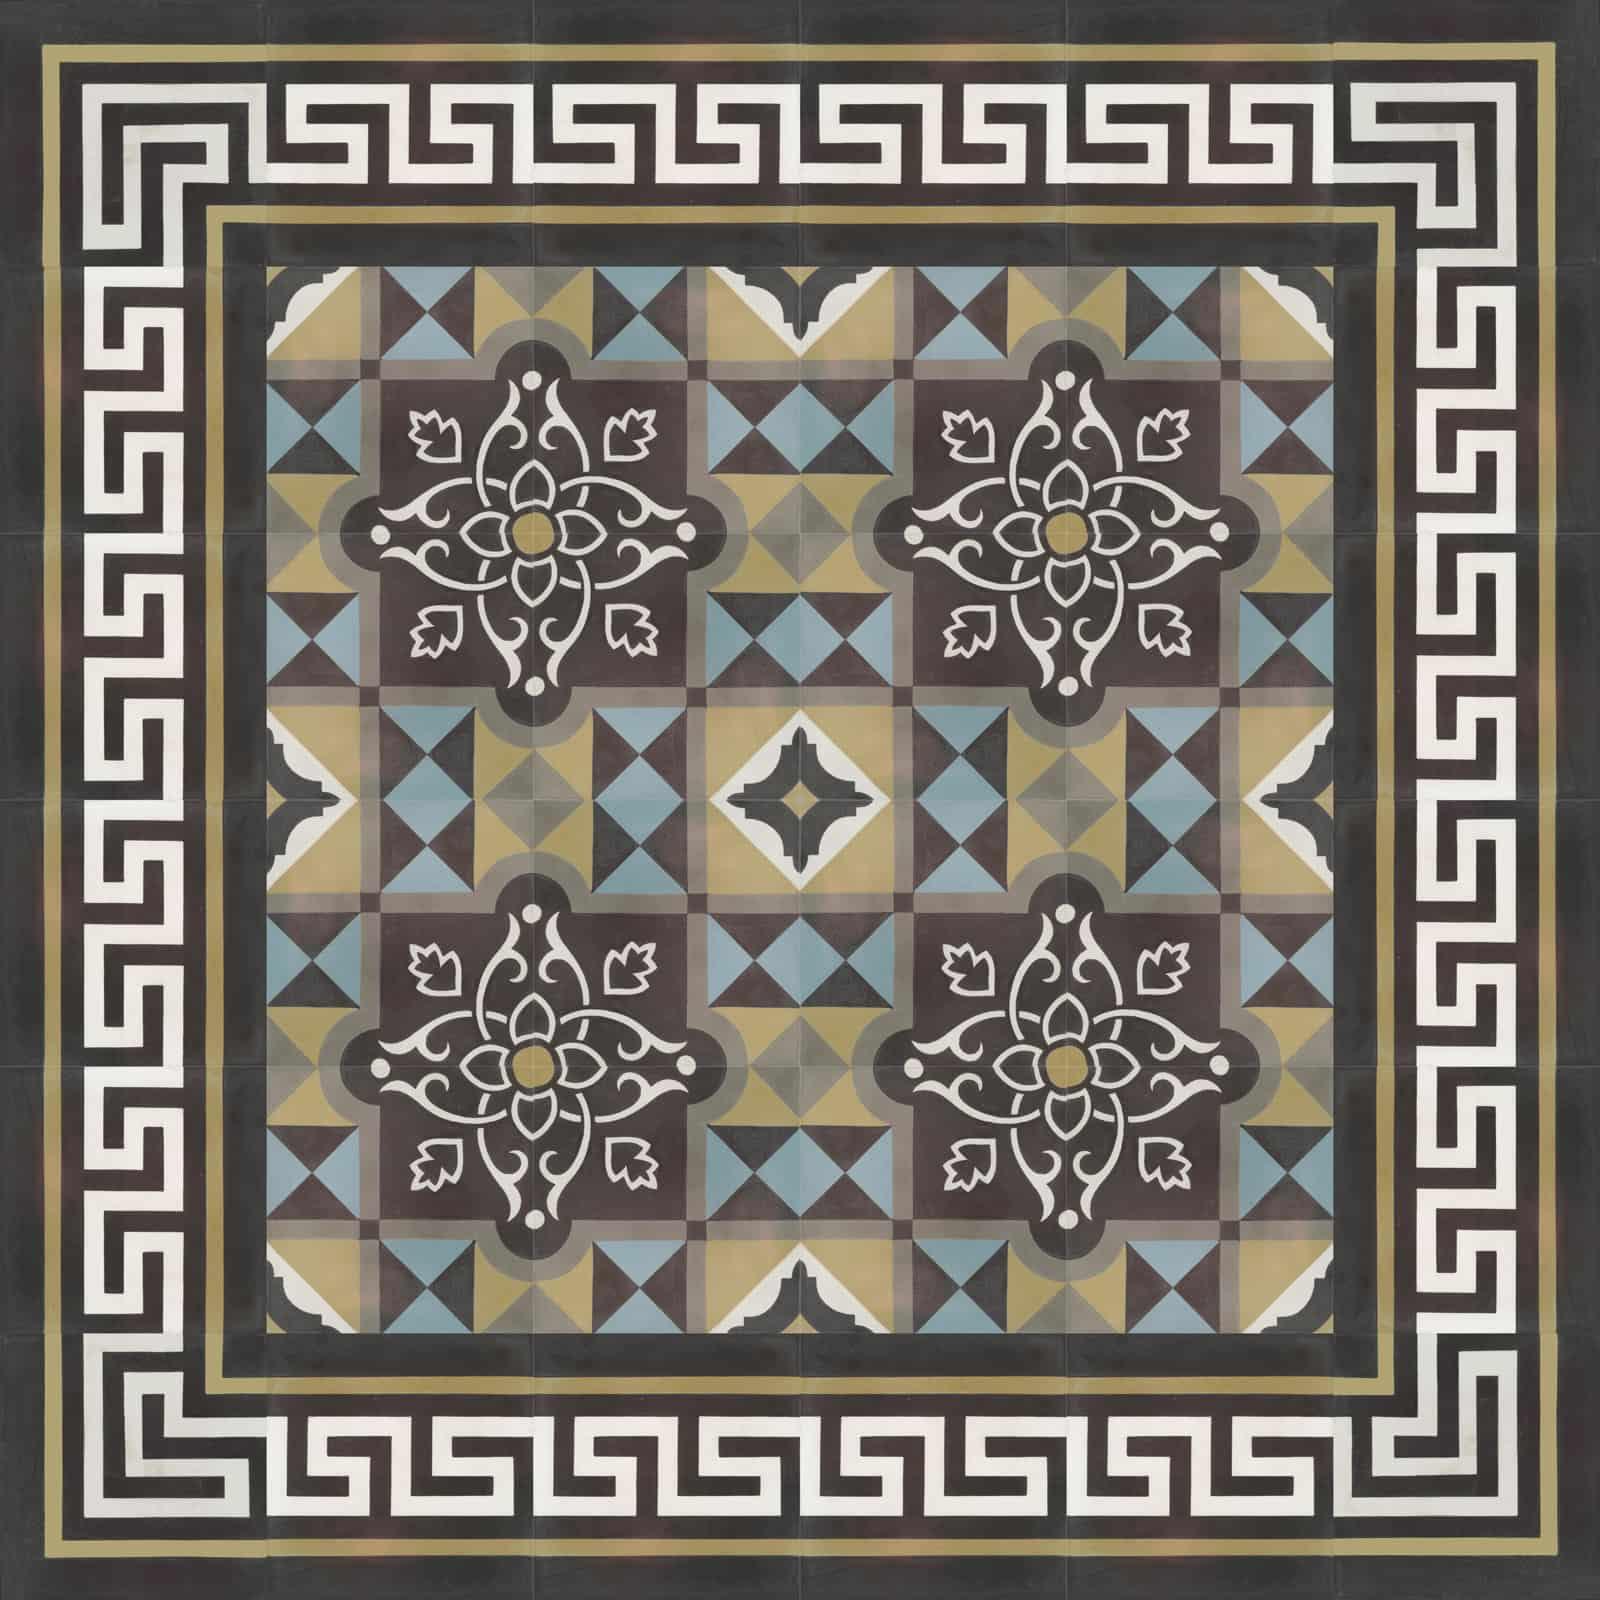 zementfliesen-verlegemuster-nummer-12460-viaplatten   12460